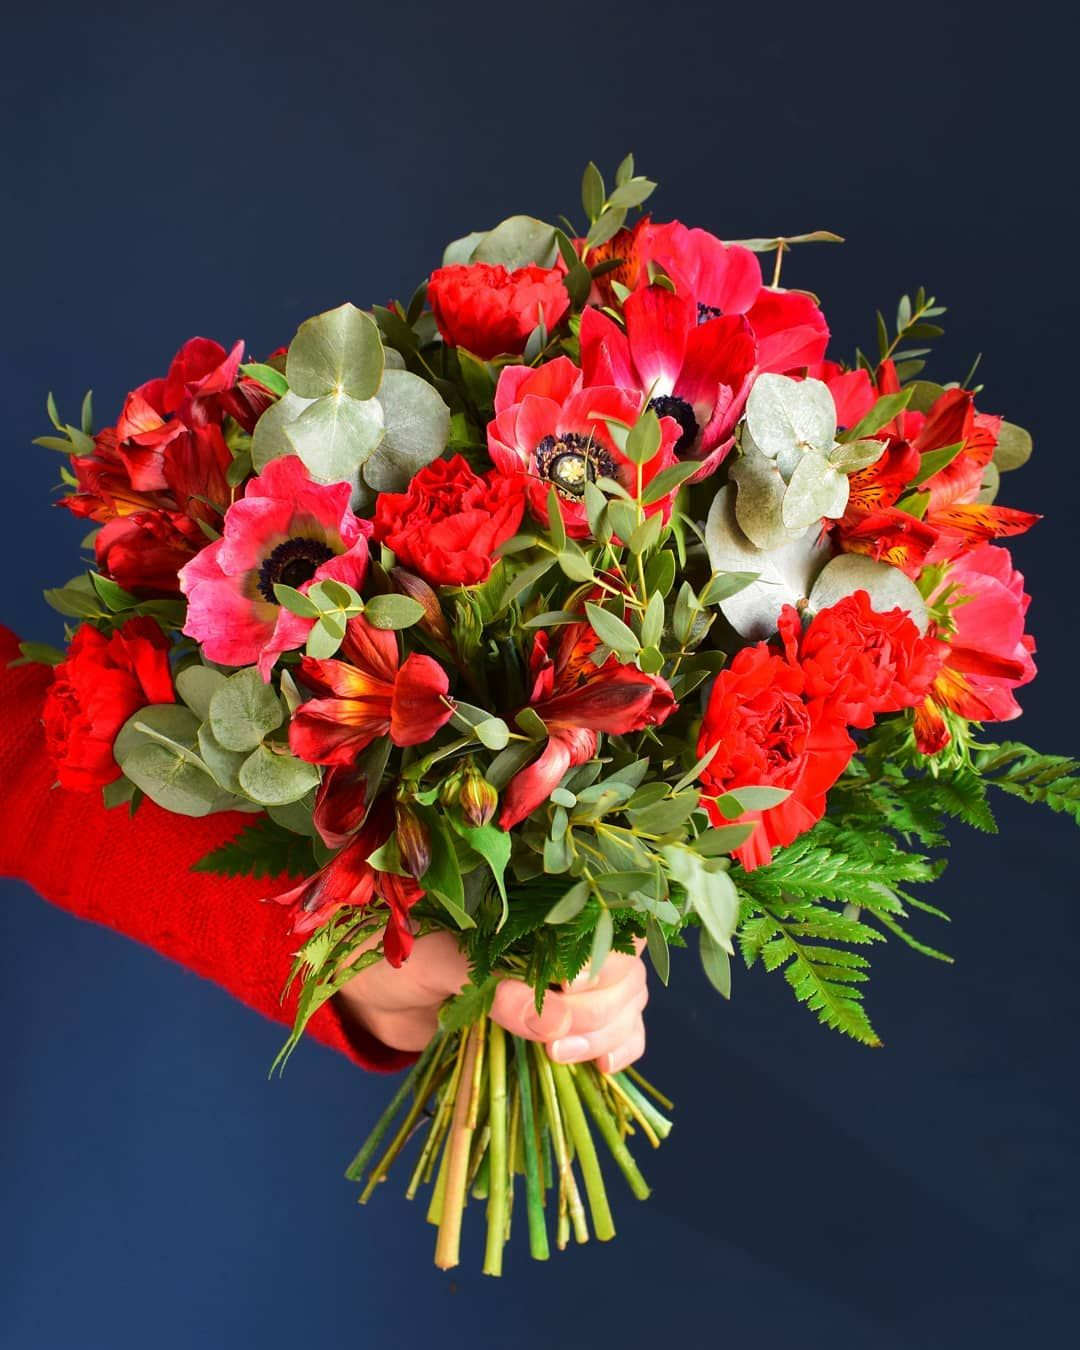 Pin On Seasonal Bouquets